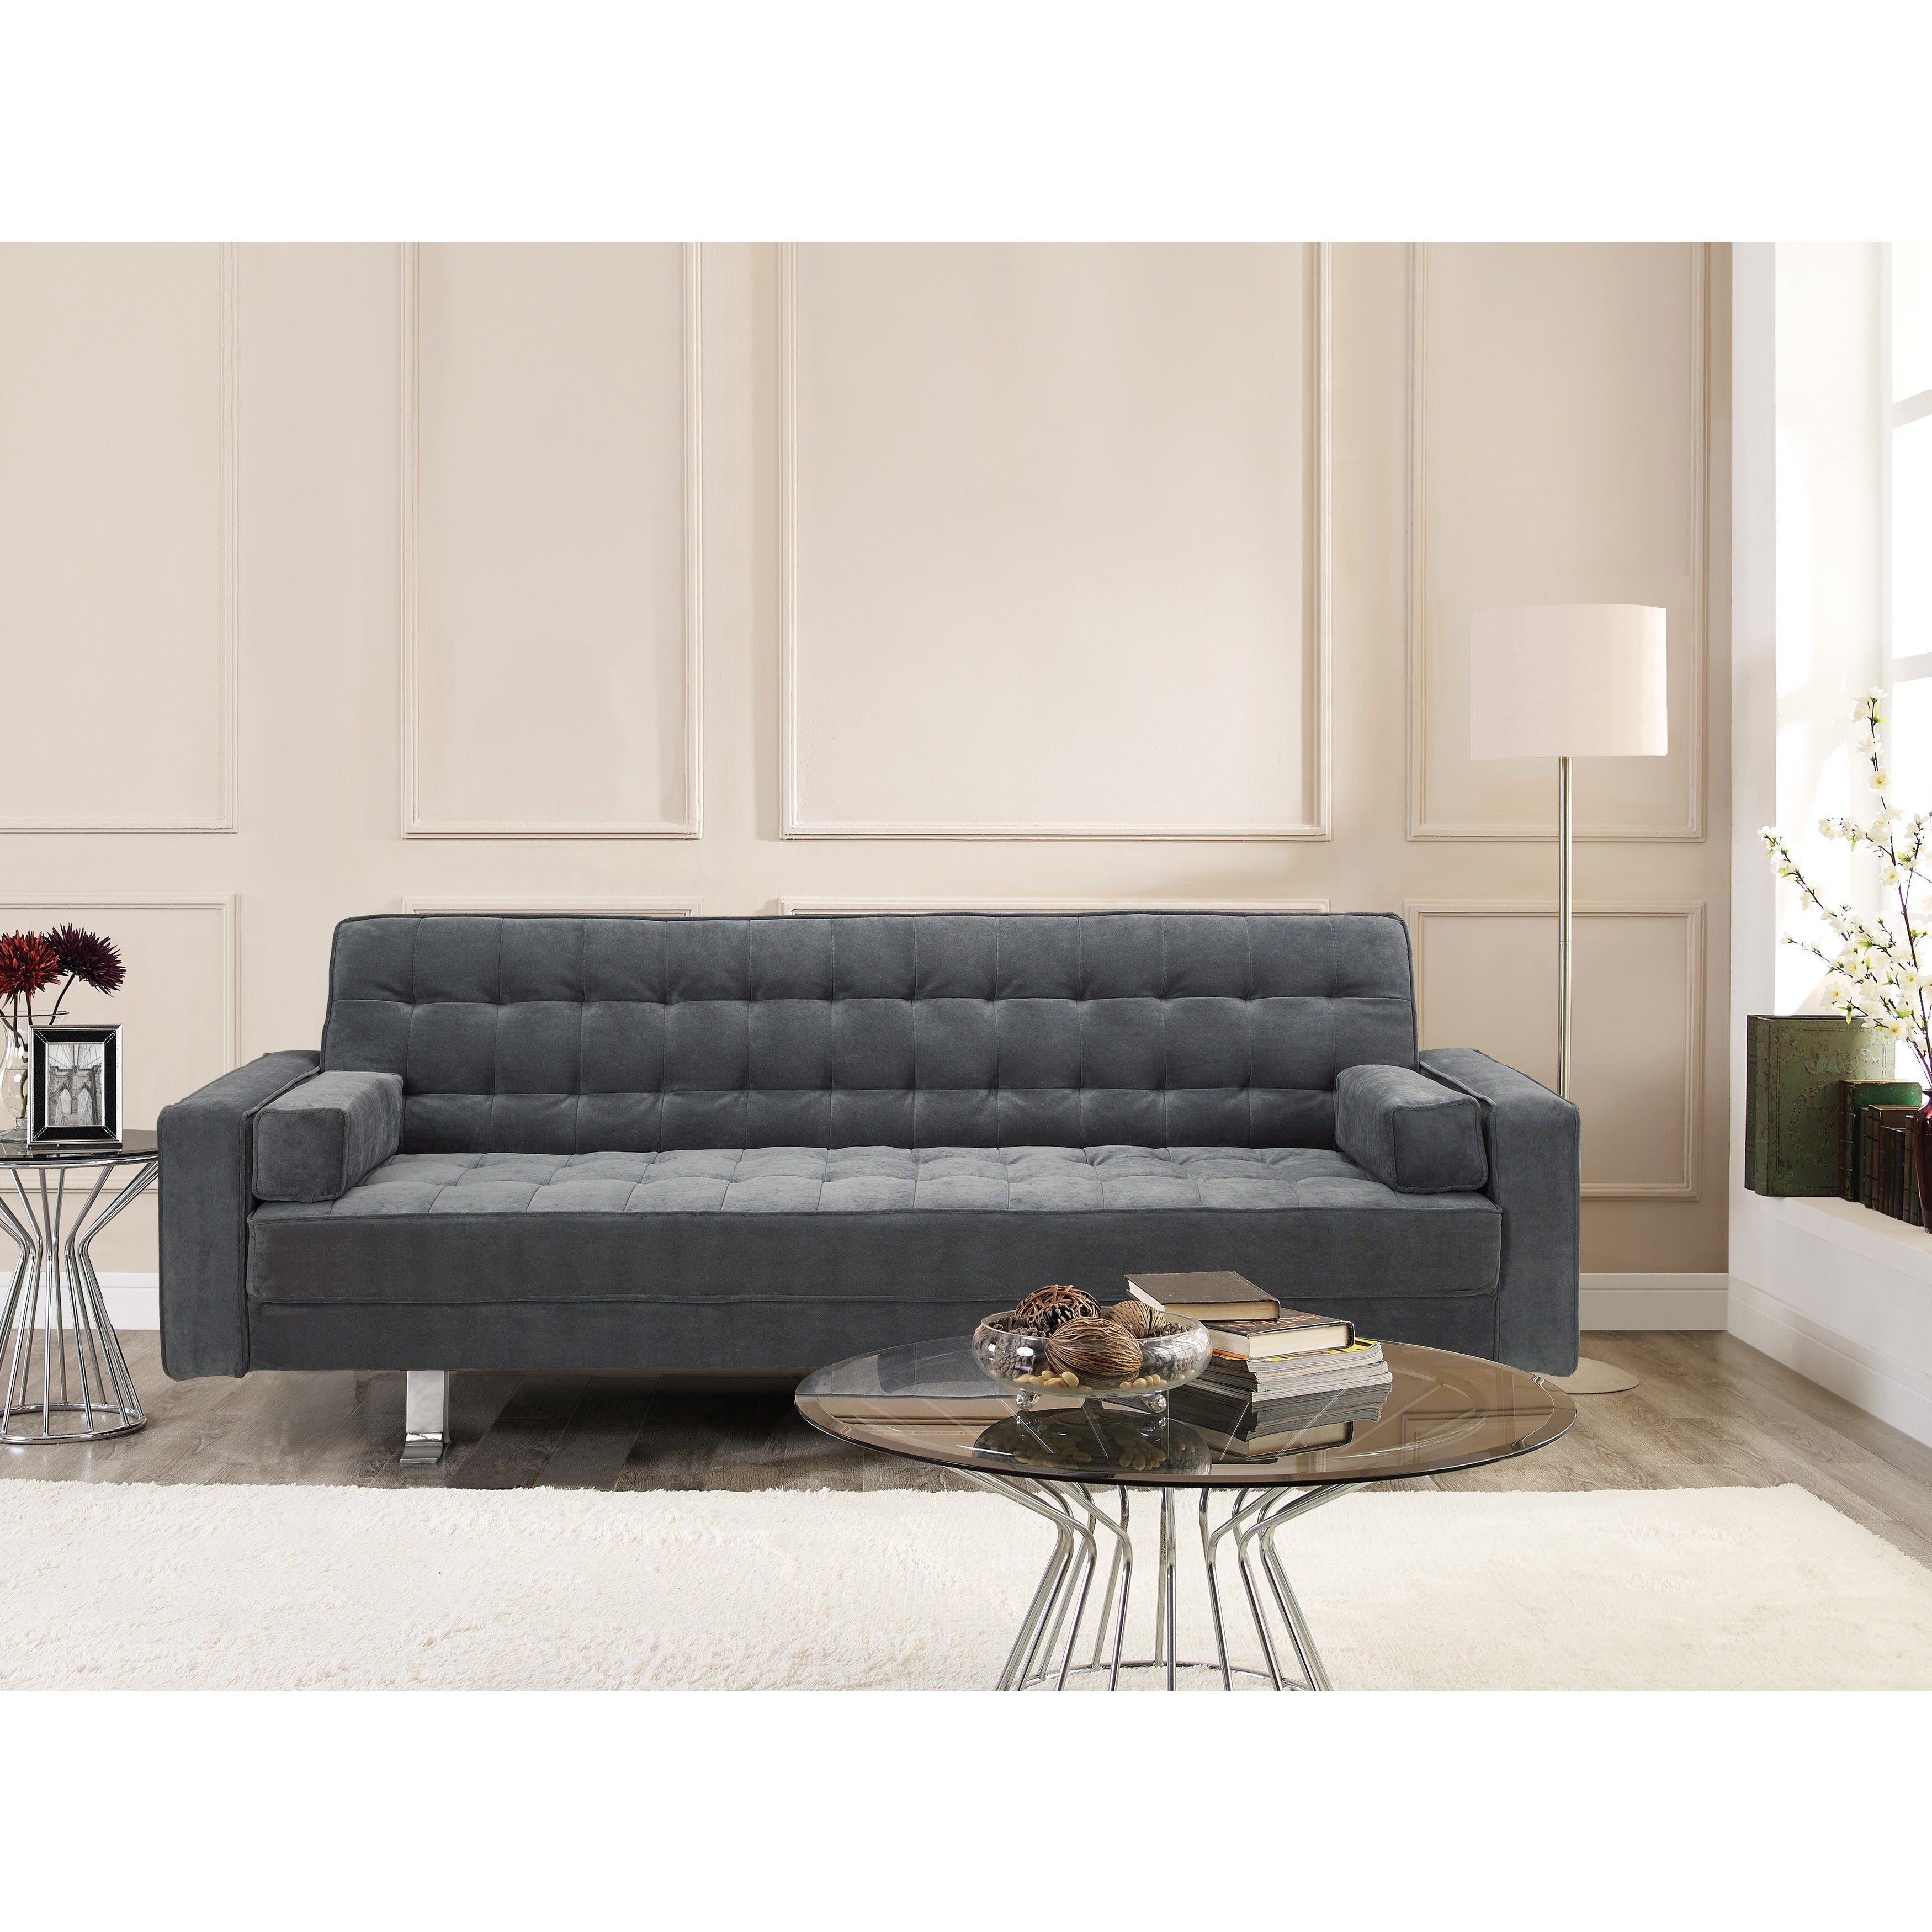 Sofa Grey Fabric Coffee Tables Ideas